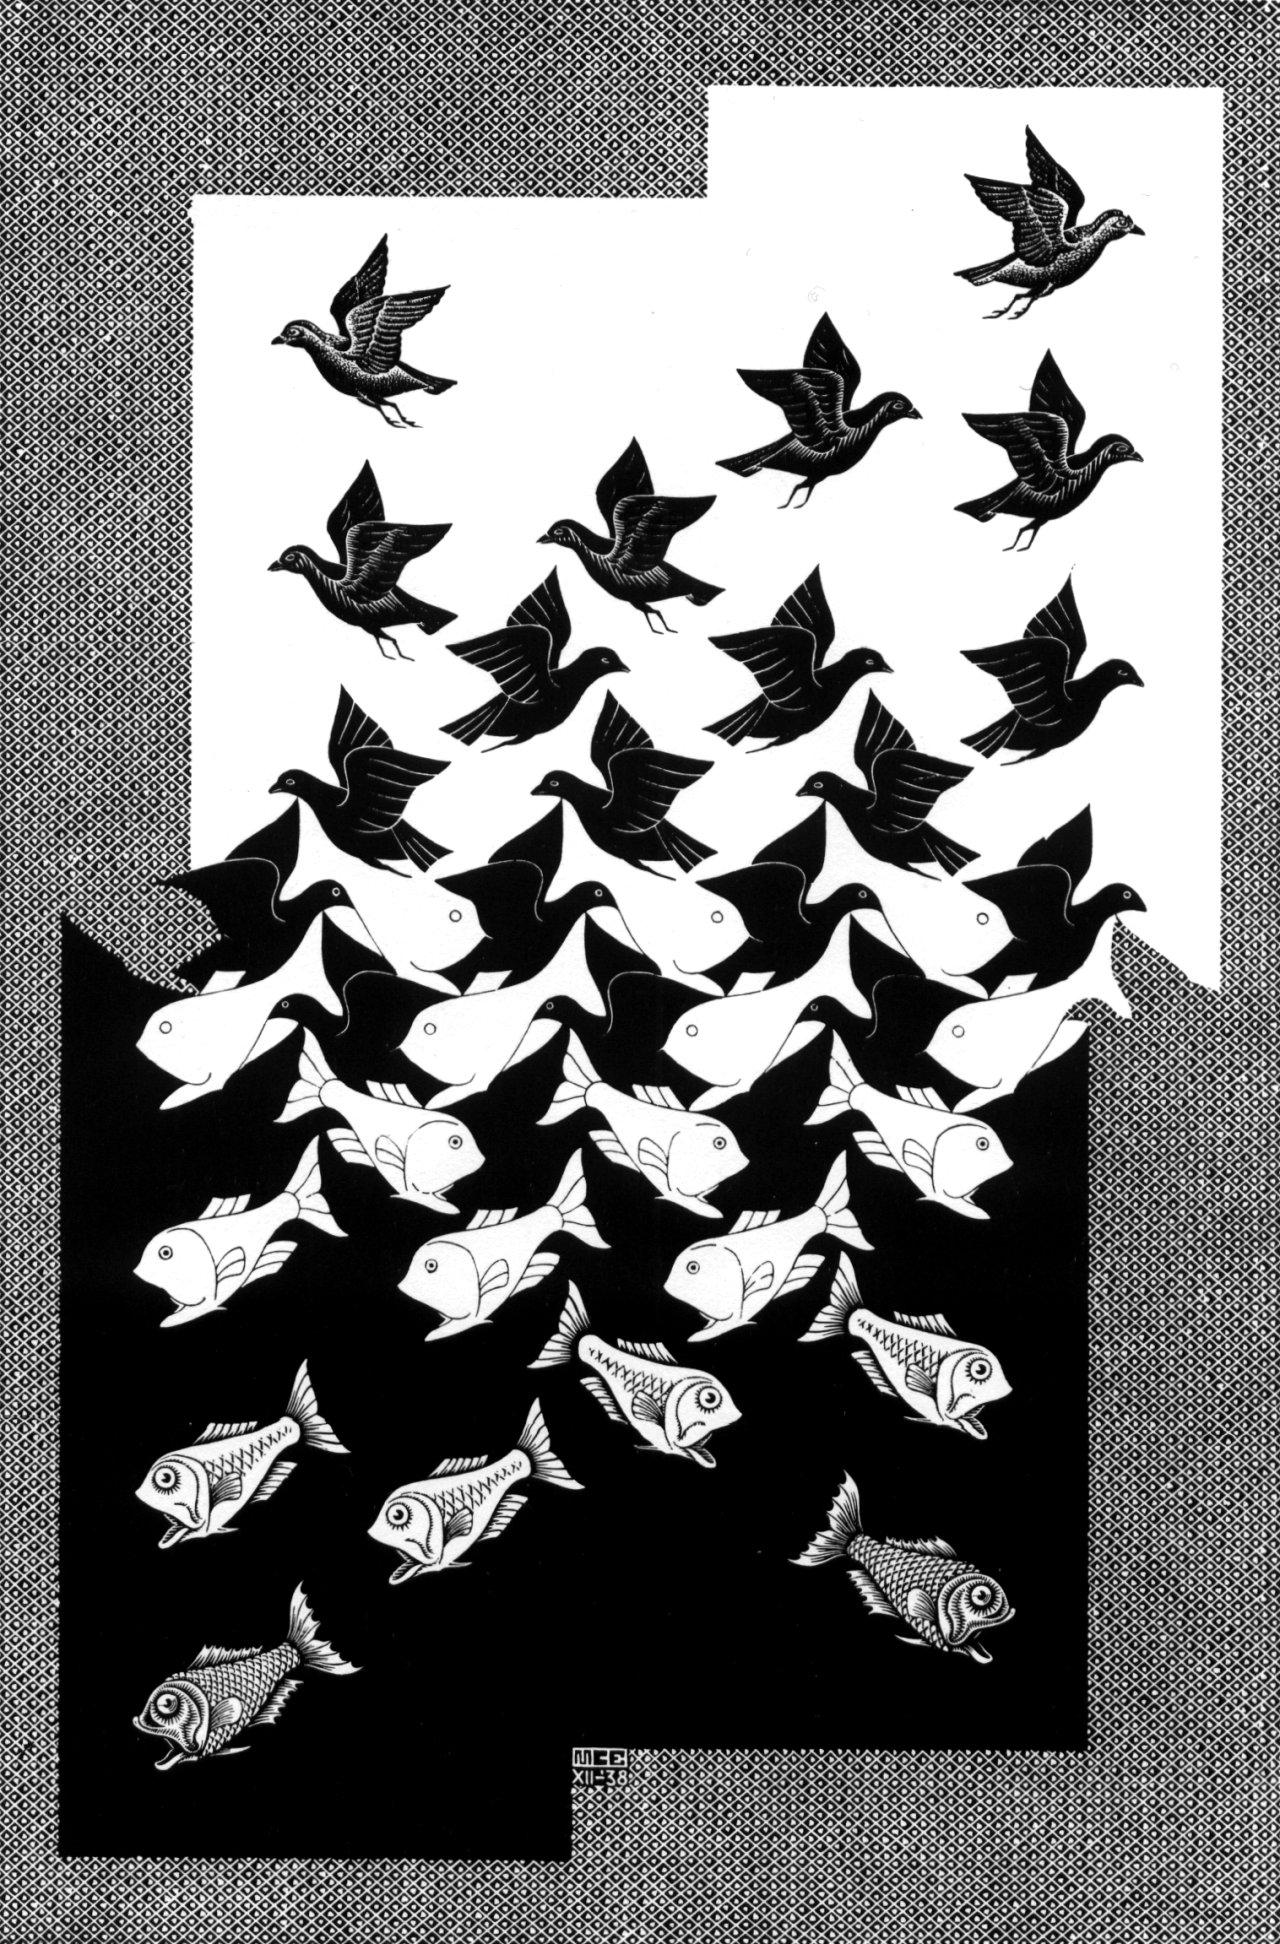 M. C. Escher Tessellations - Viewing Gallery